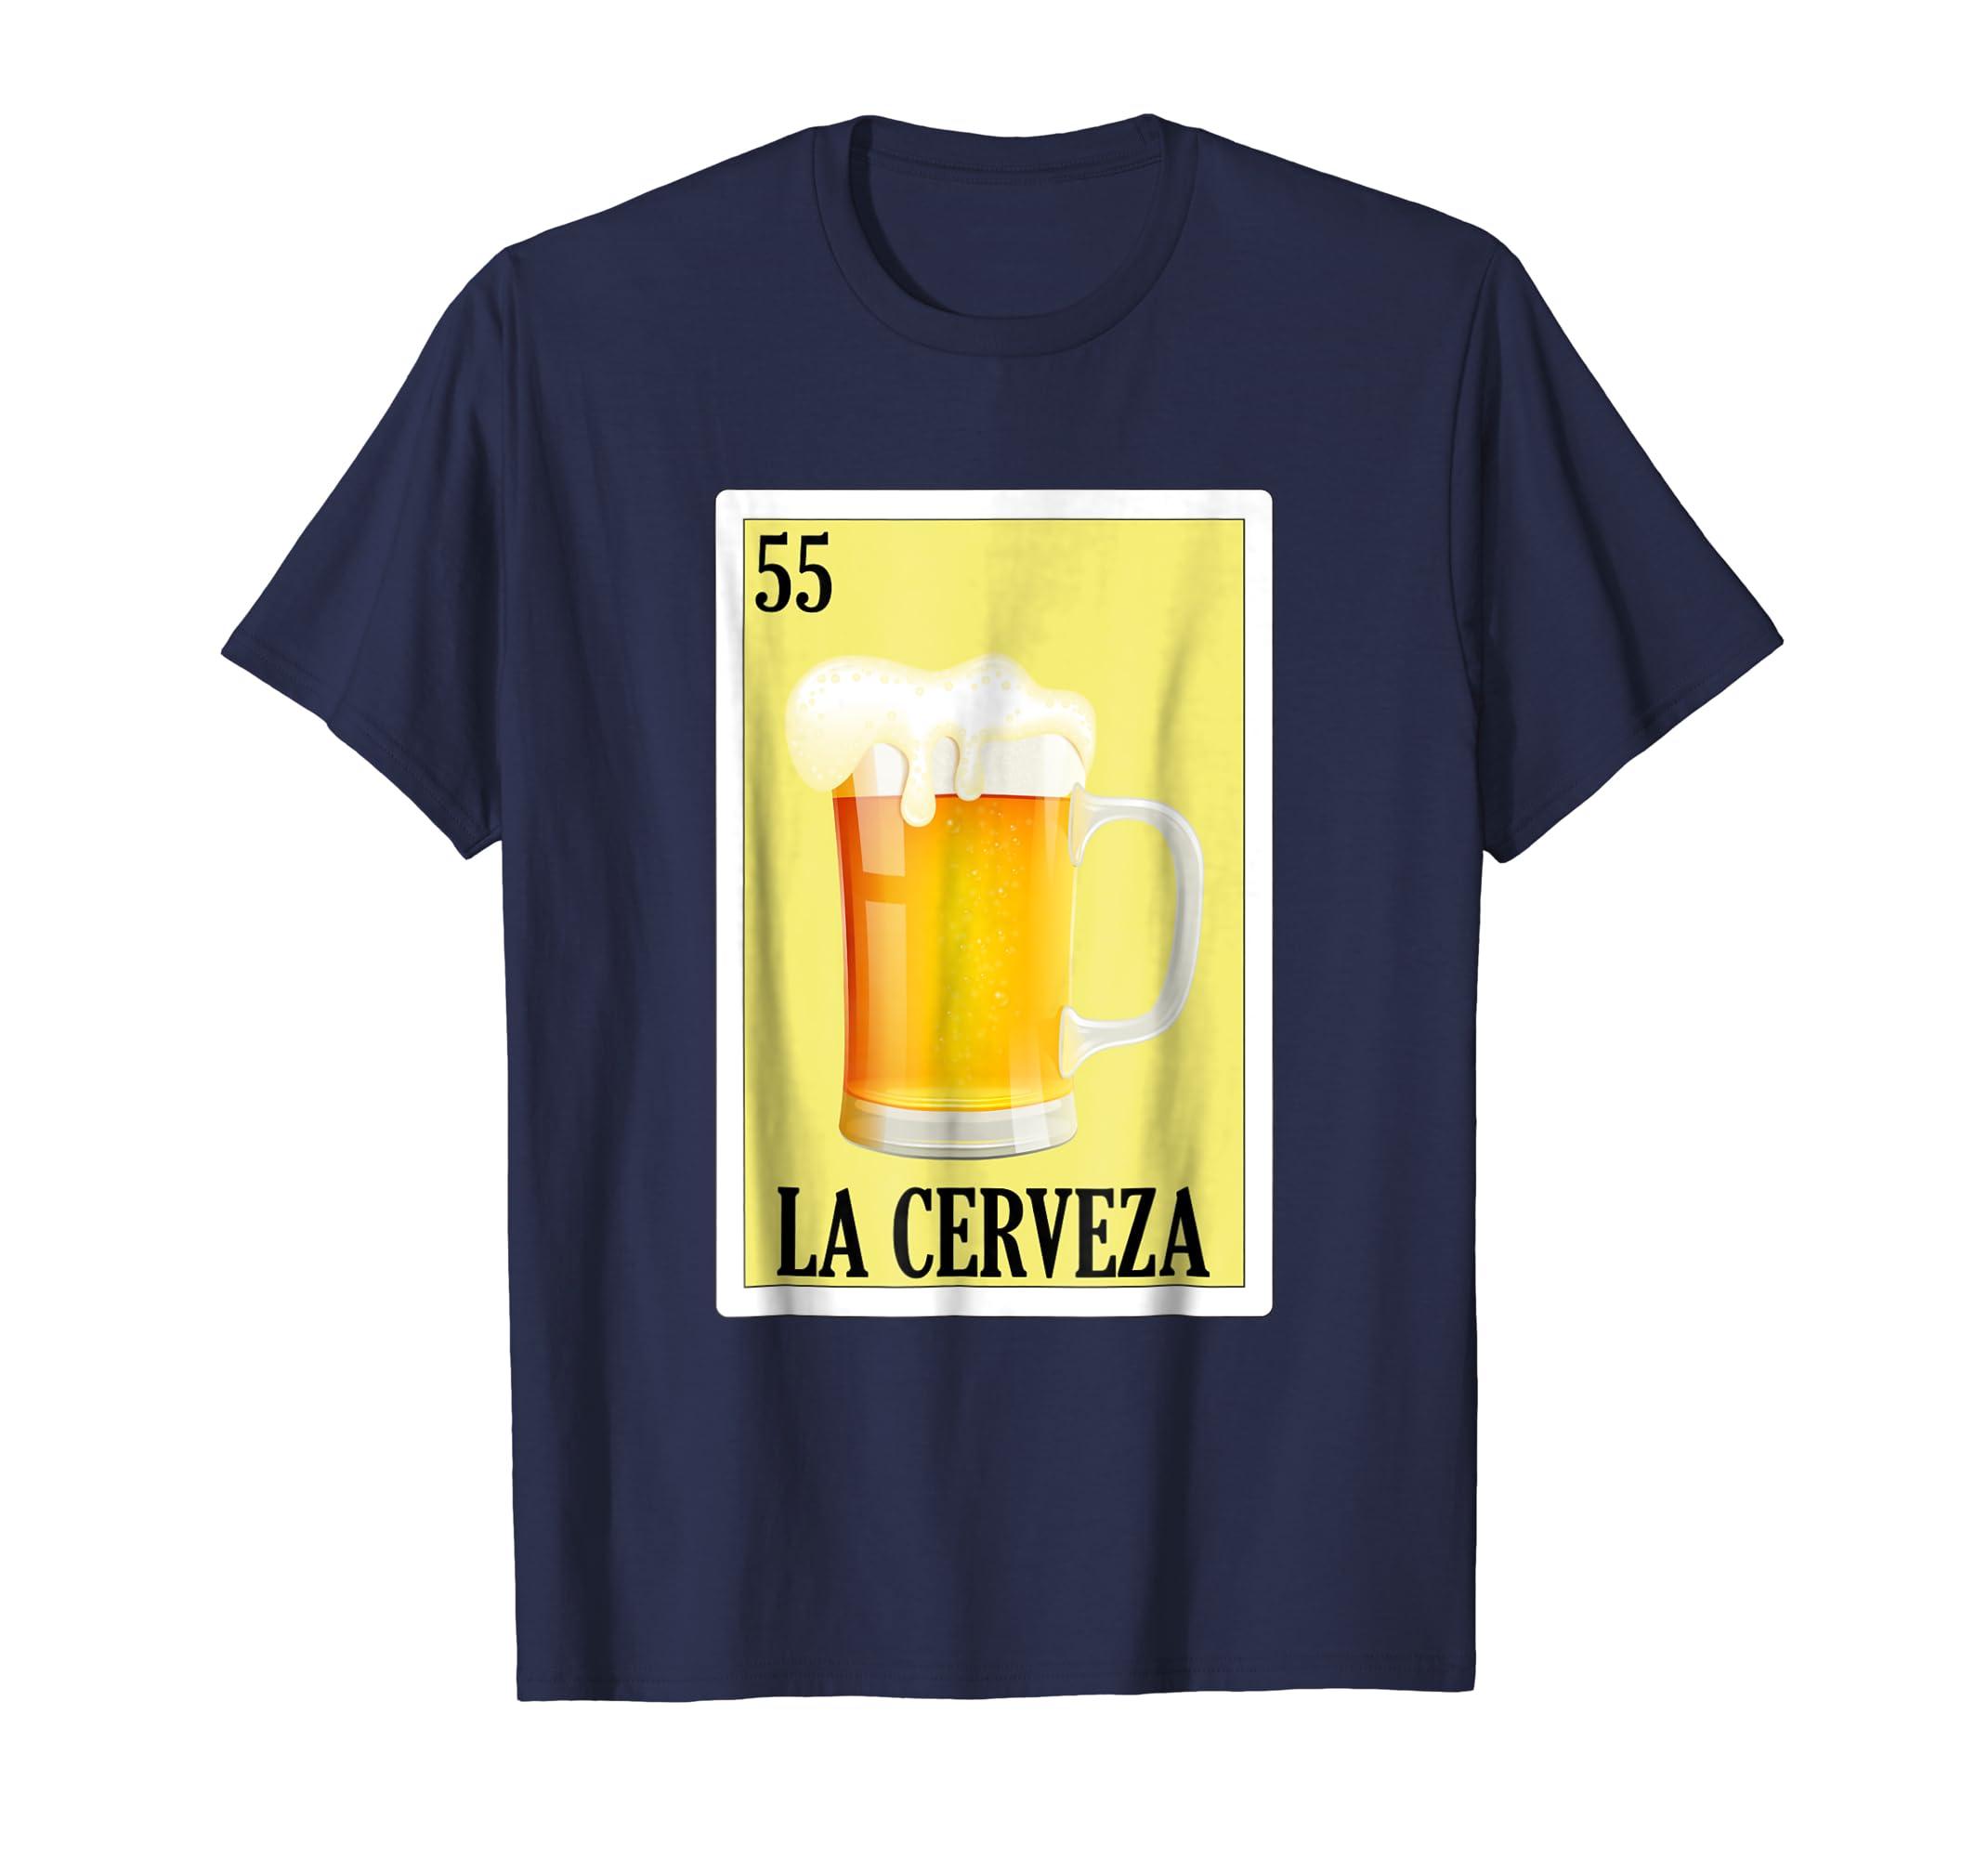 Amazon.com: Loteria Shirts - La Cerveza T Shirt Classic Version: Clothing